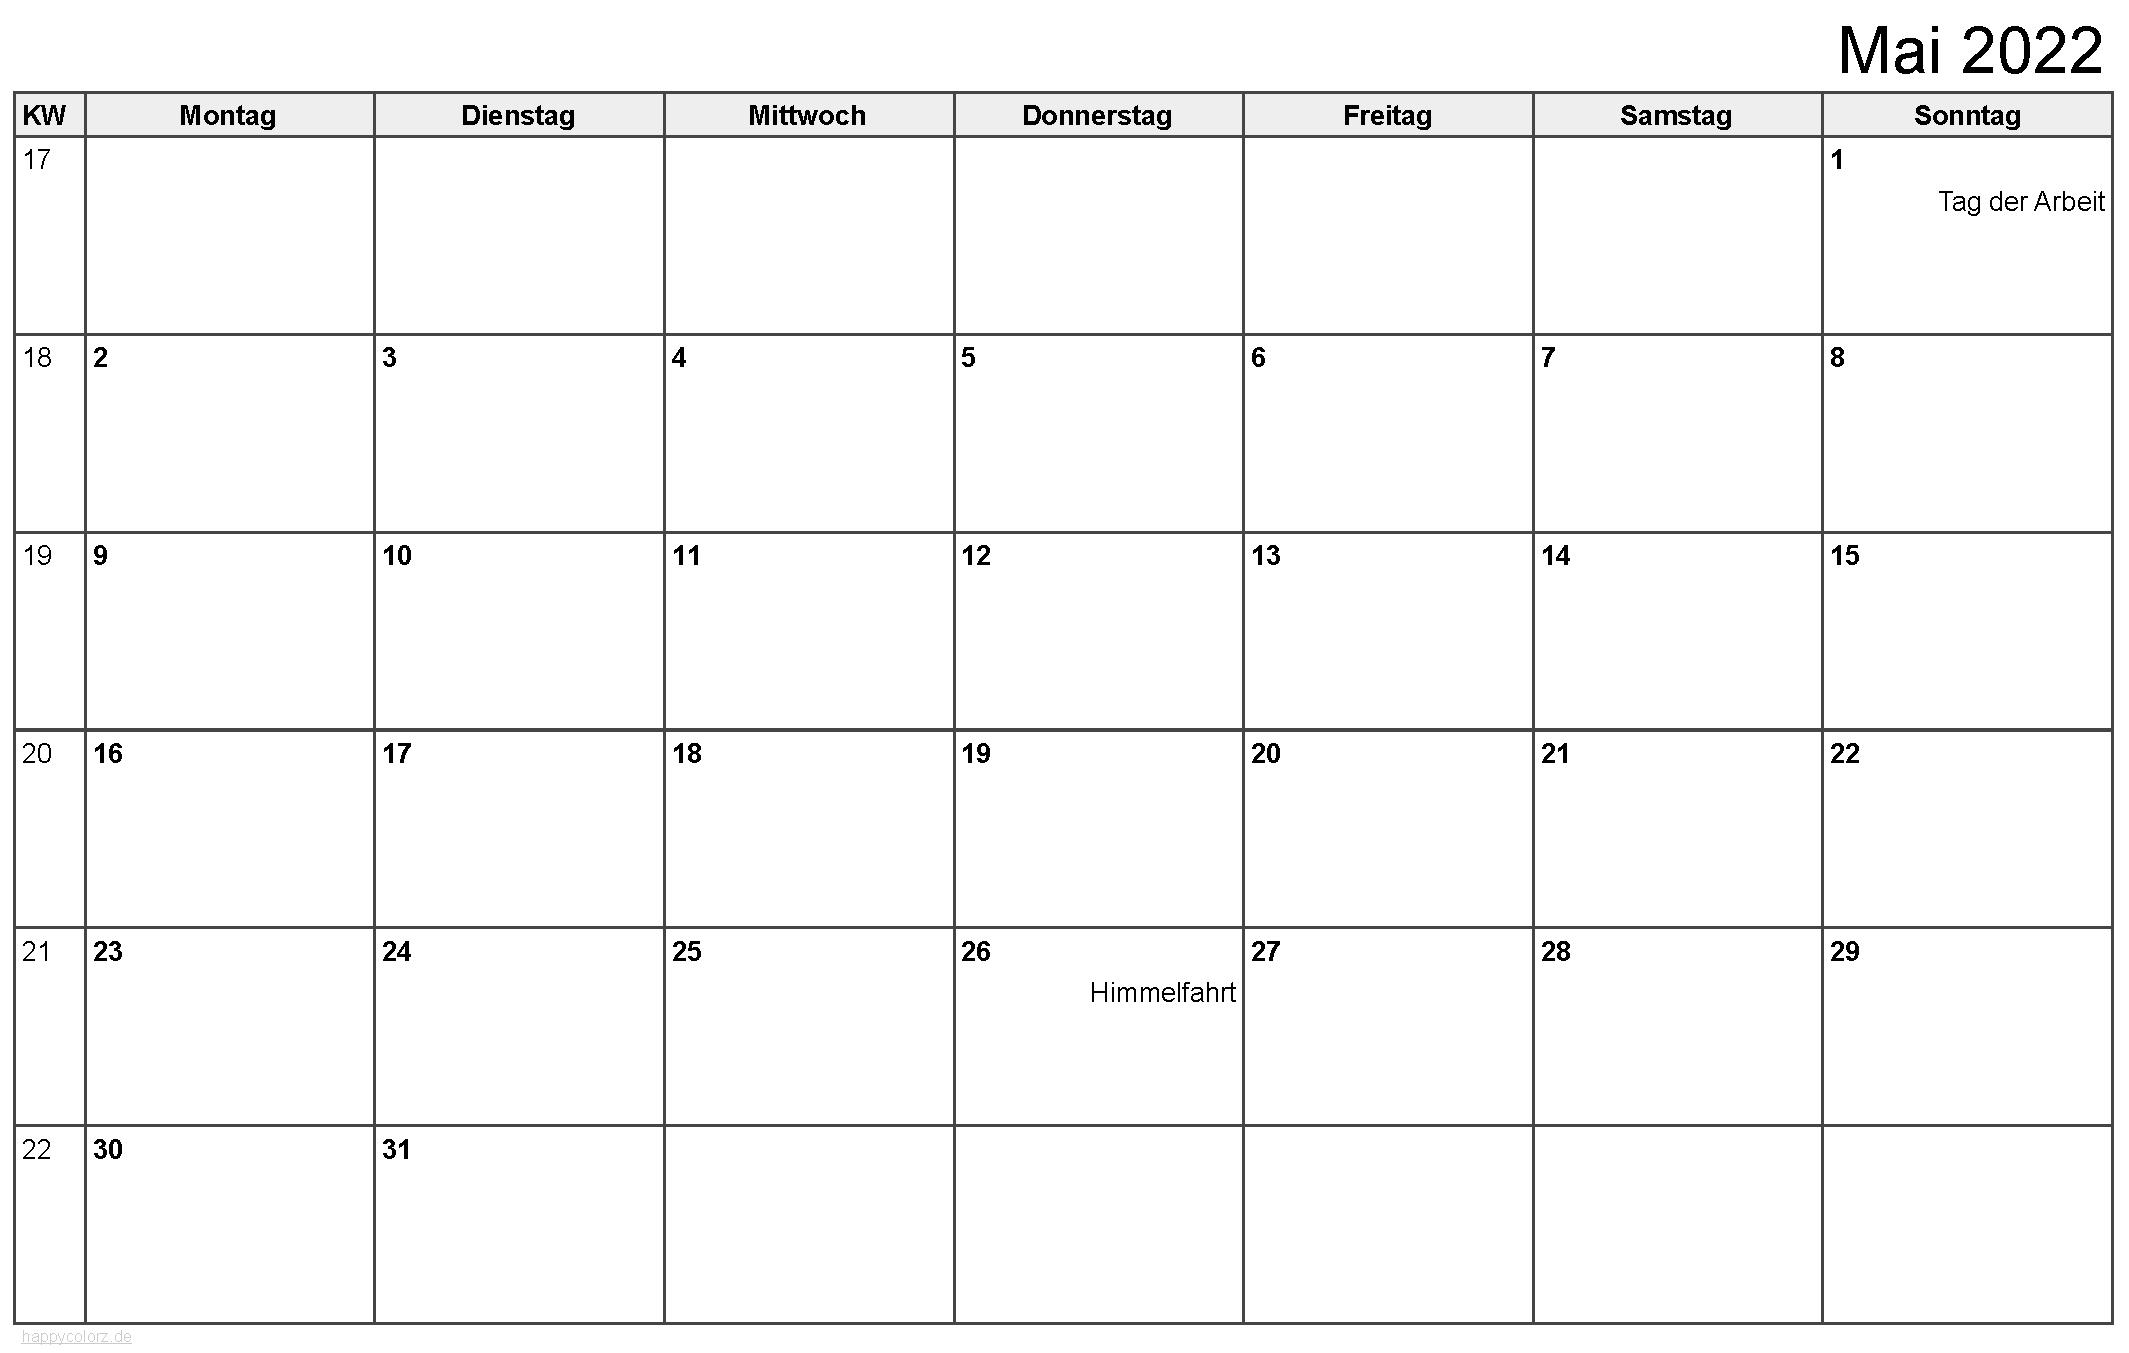 Kalender Mai 2022 zum Ausdrucken